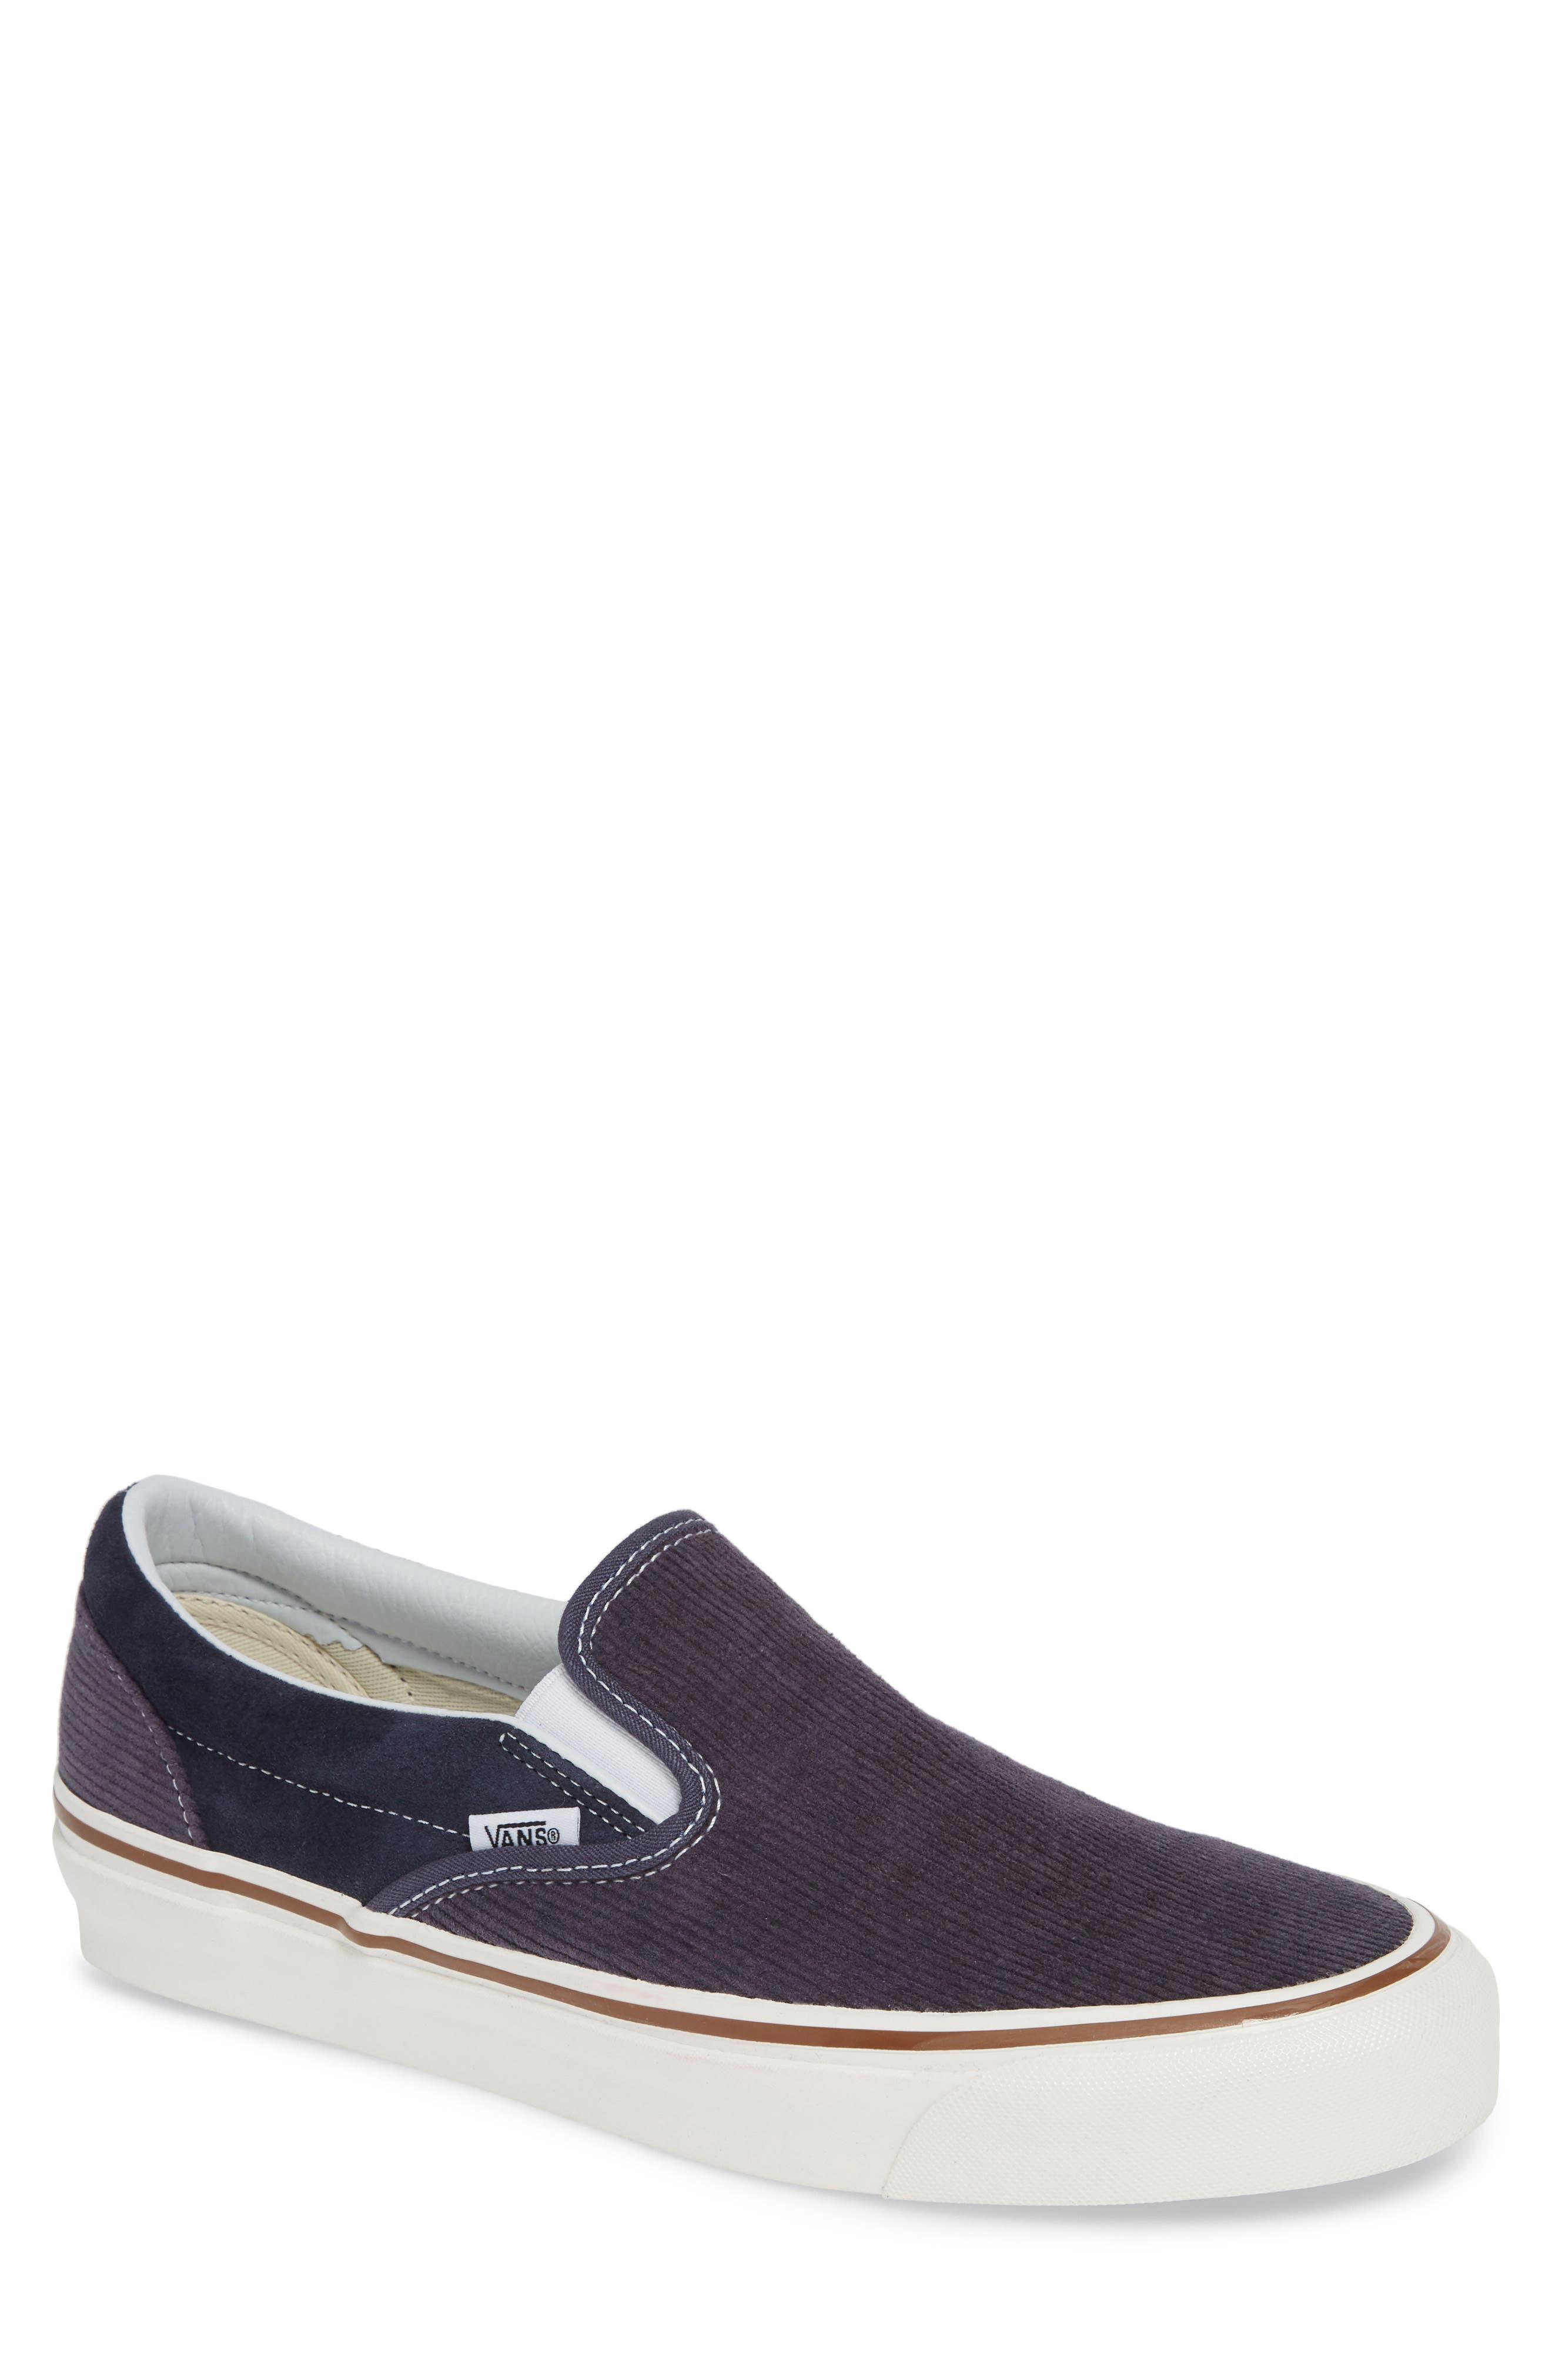 Classic 98 Dx Slip-On Sneaker in Navy/ Corduroy